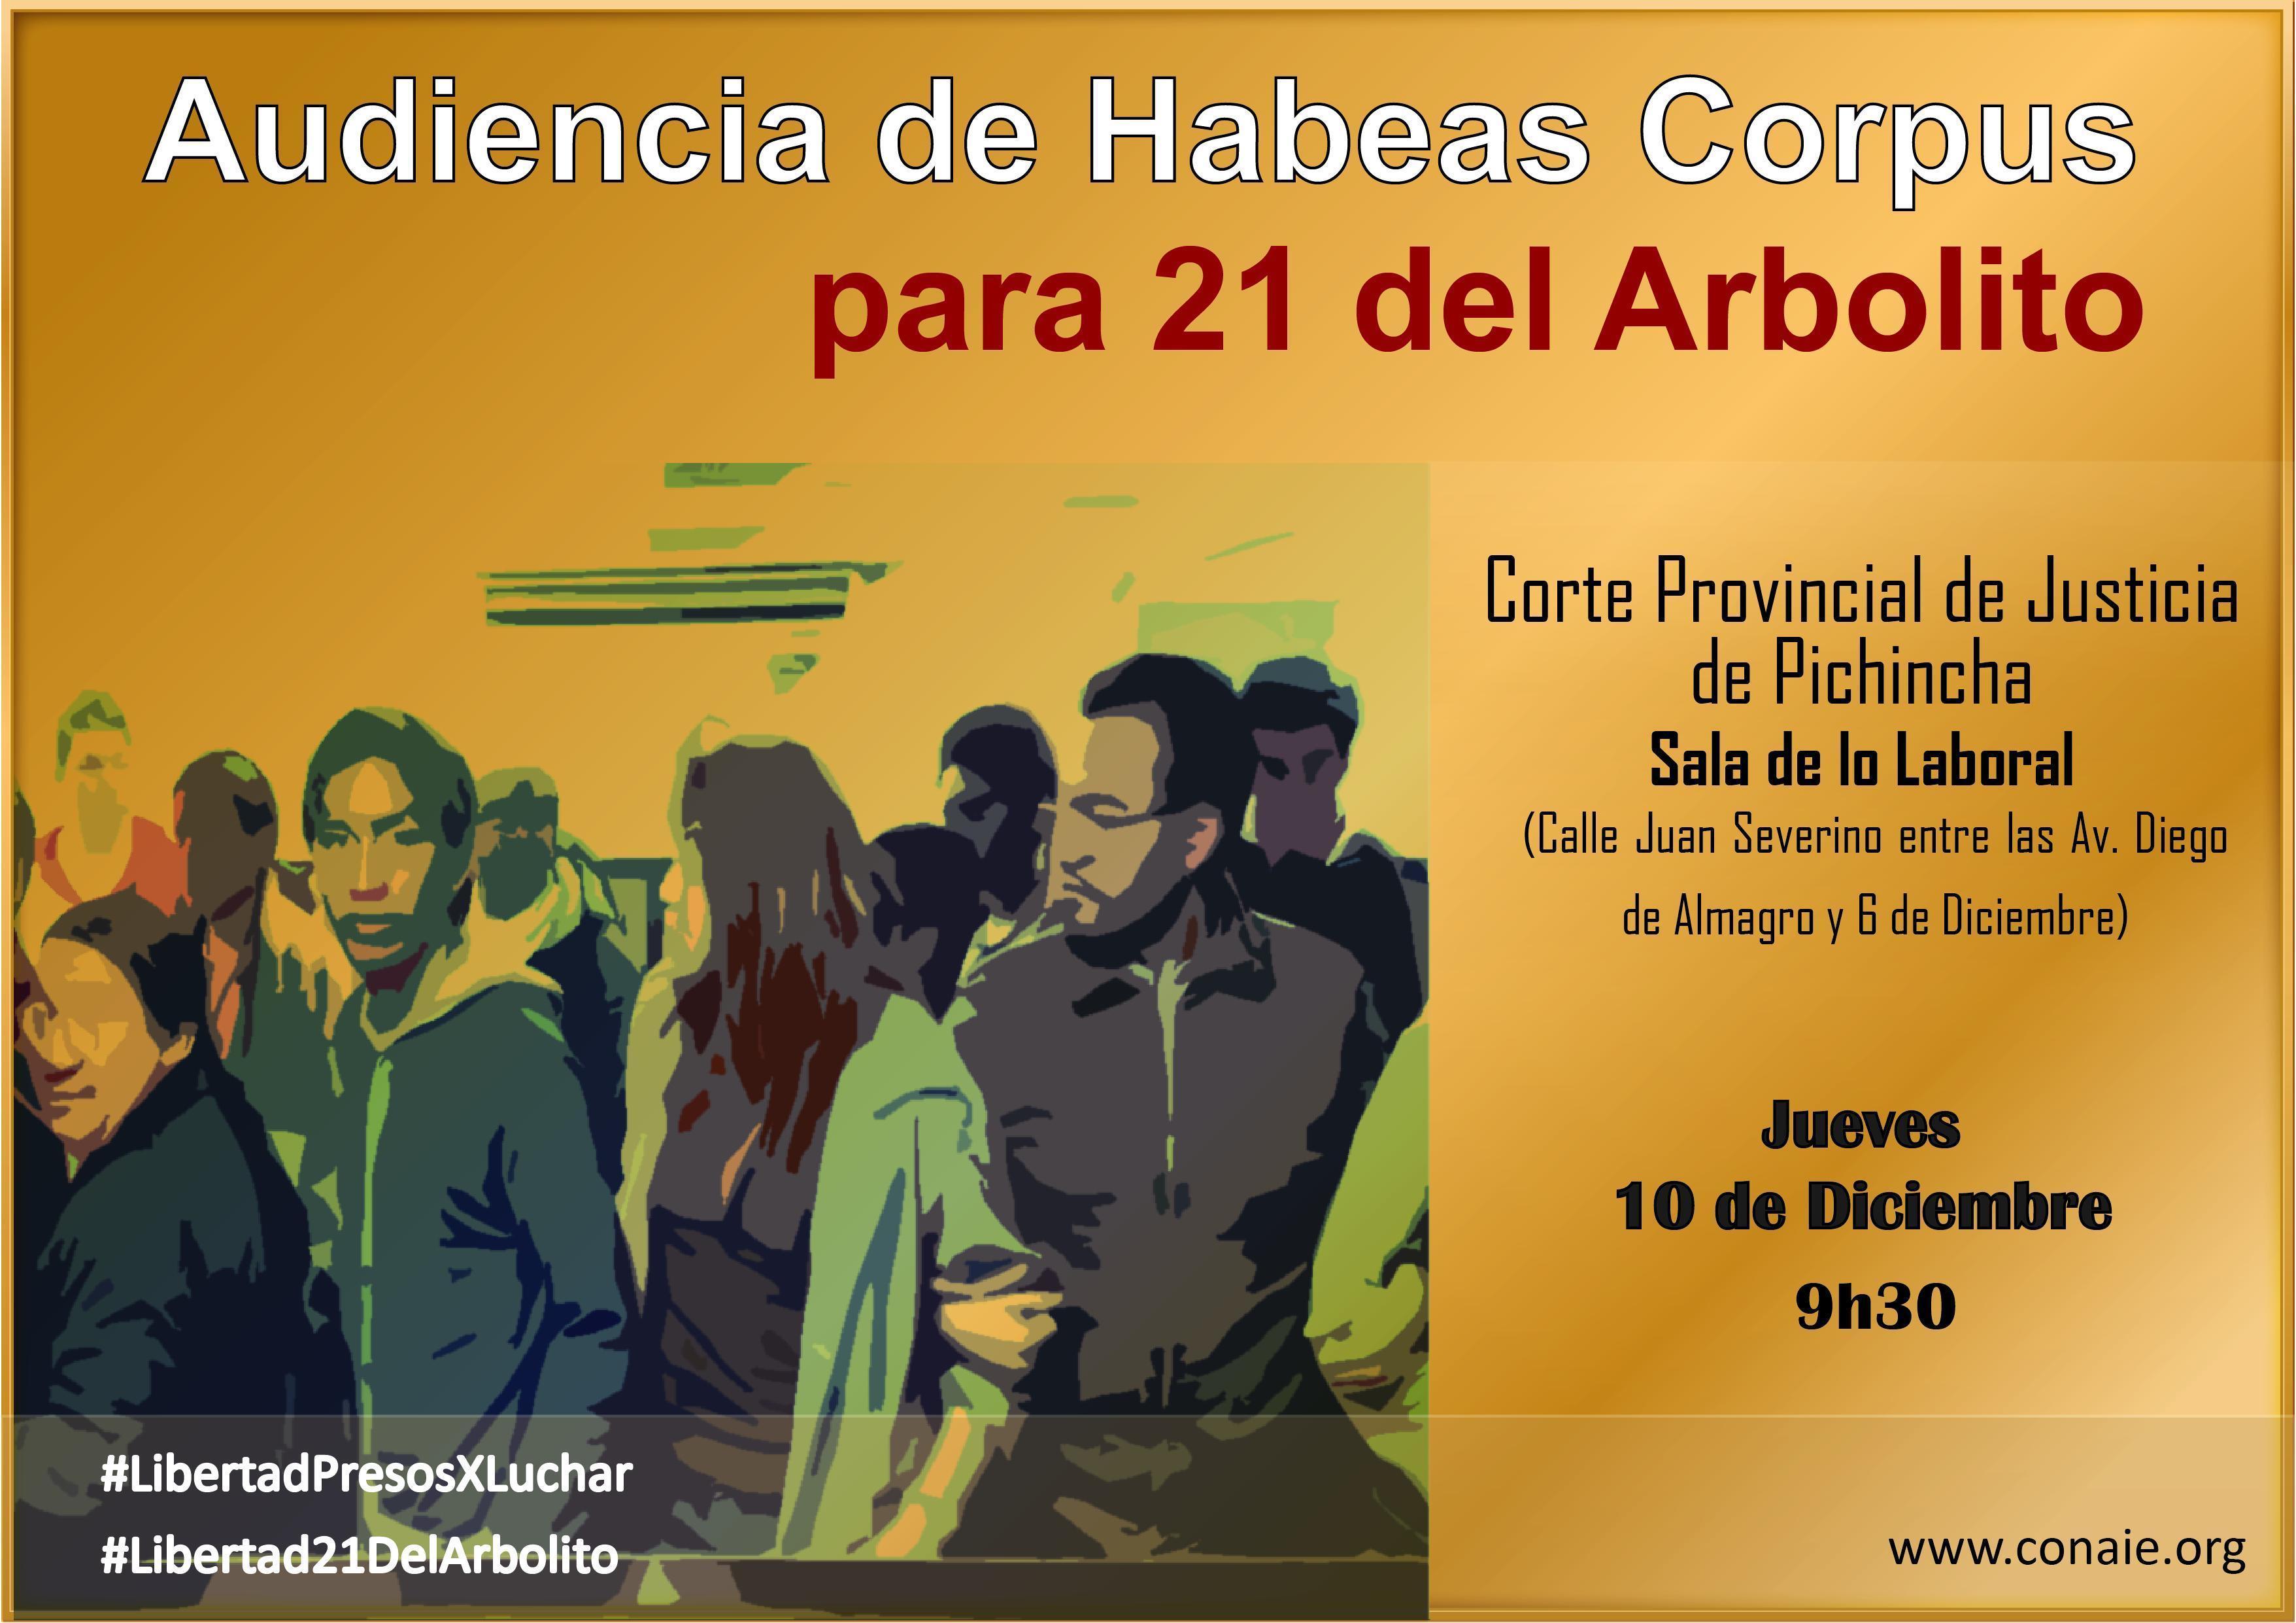 Audiencia Habeas Corpus